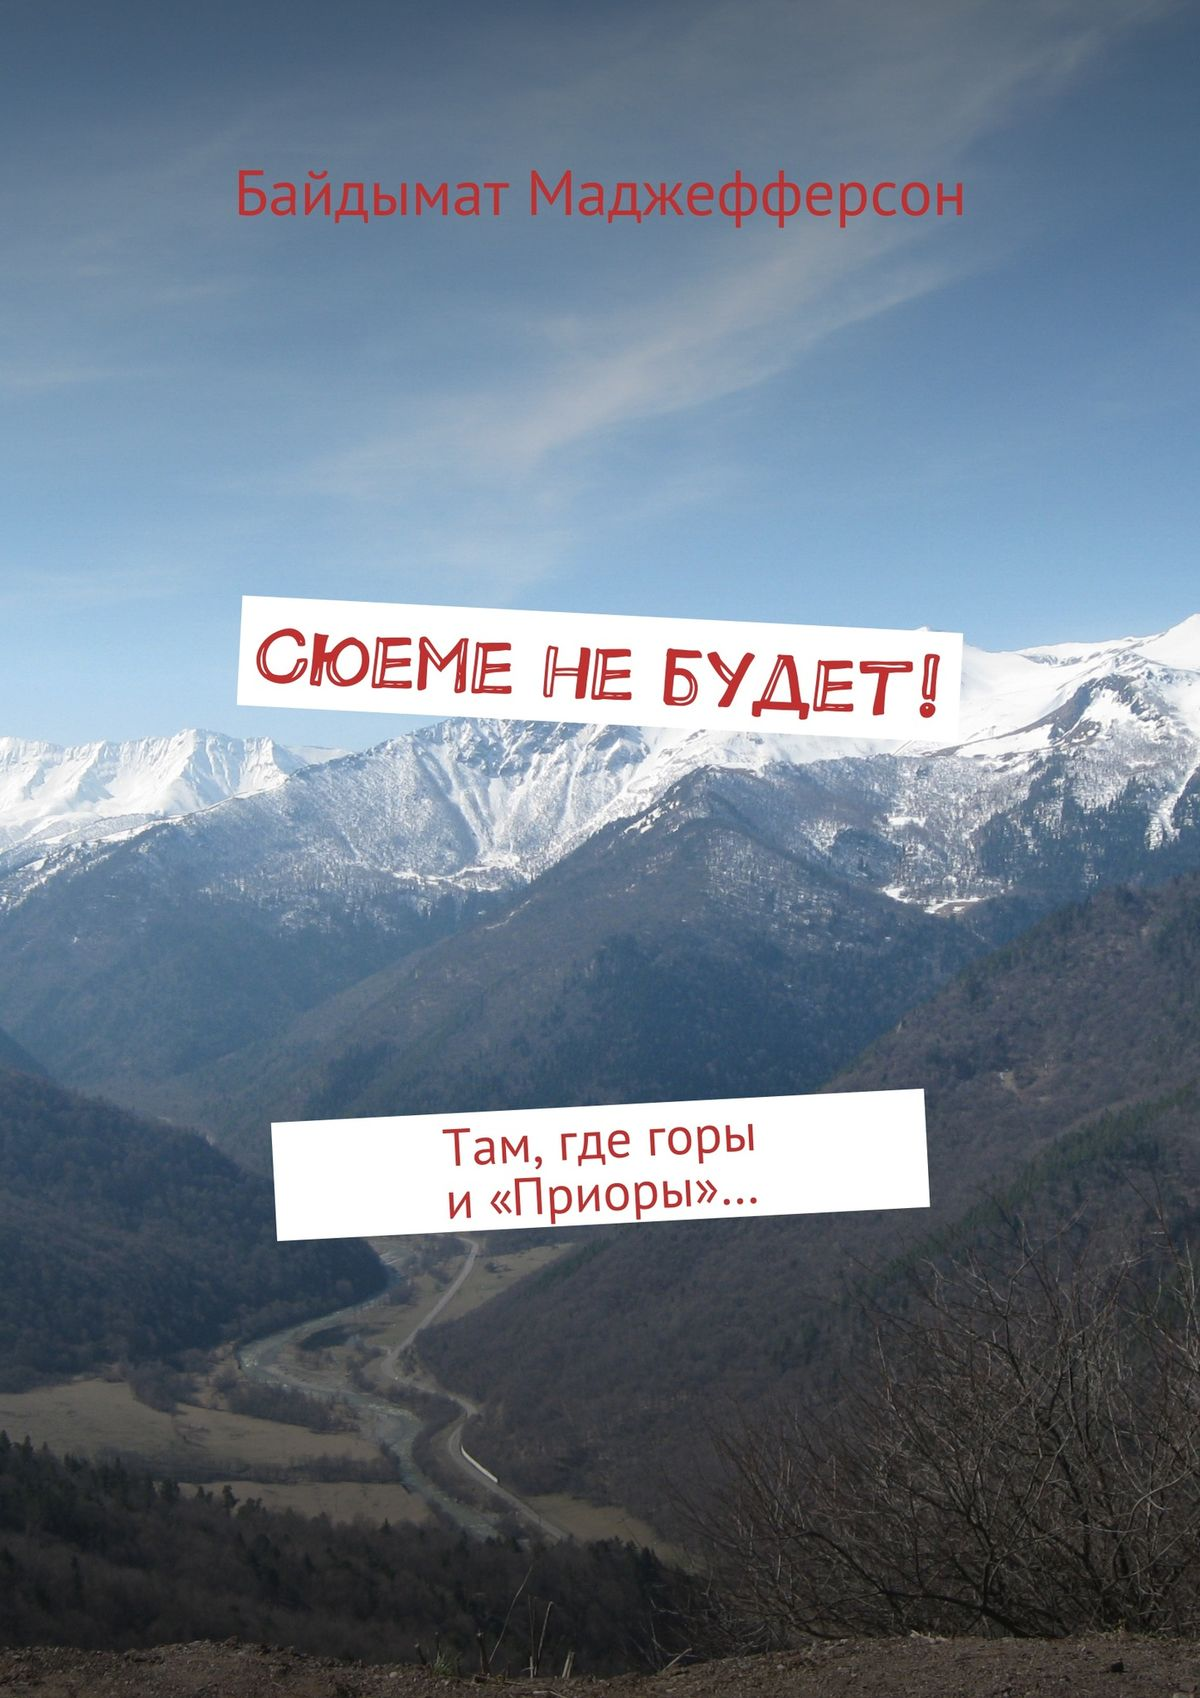 Байдымат Маджефферсон Сюеме небудет! Там, где горы и«Приоры»… александр тайгар посёлок